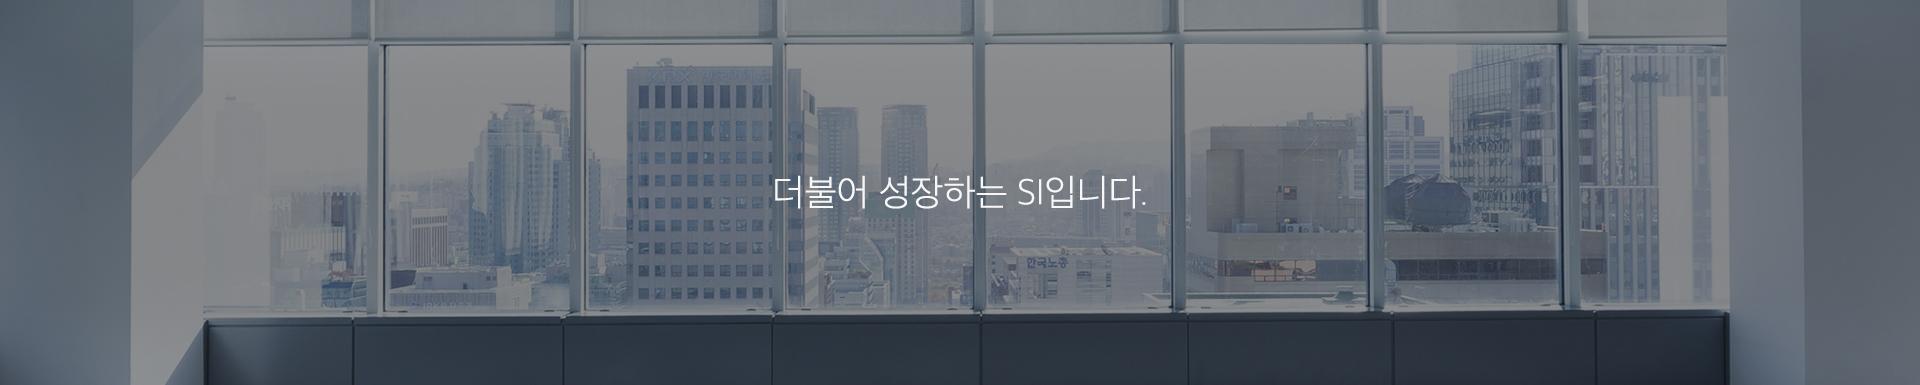 Company_introduction